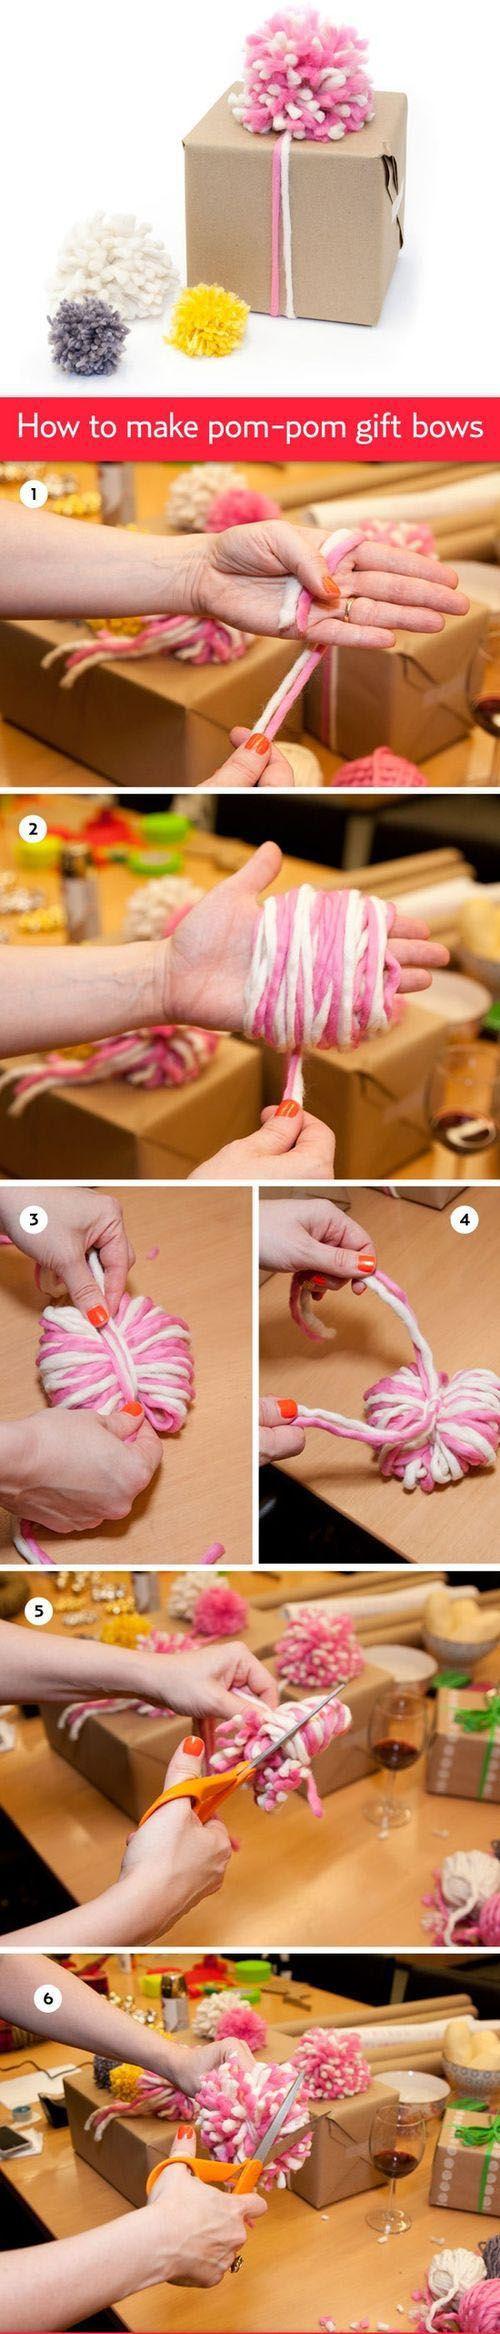 Diy Beautiful Gift Bow | DIY & Crafts Tutorials